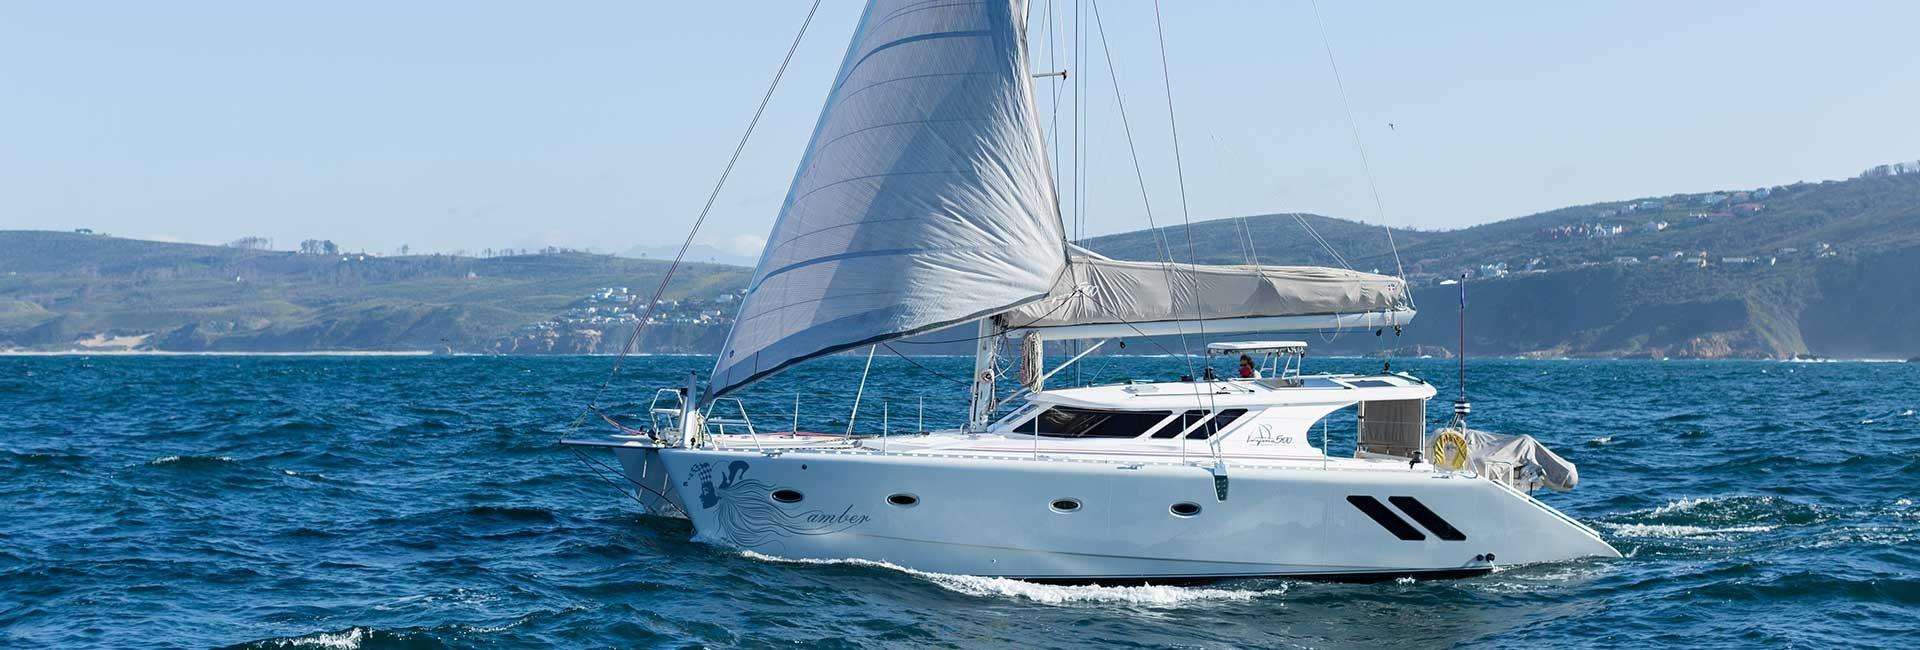 knysna yacht company catamaran on water